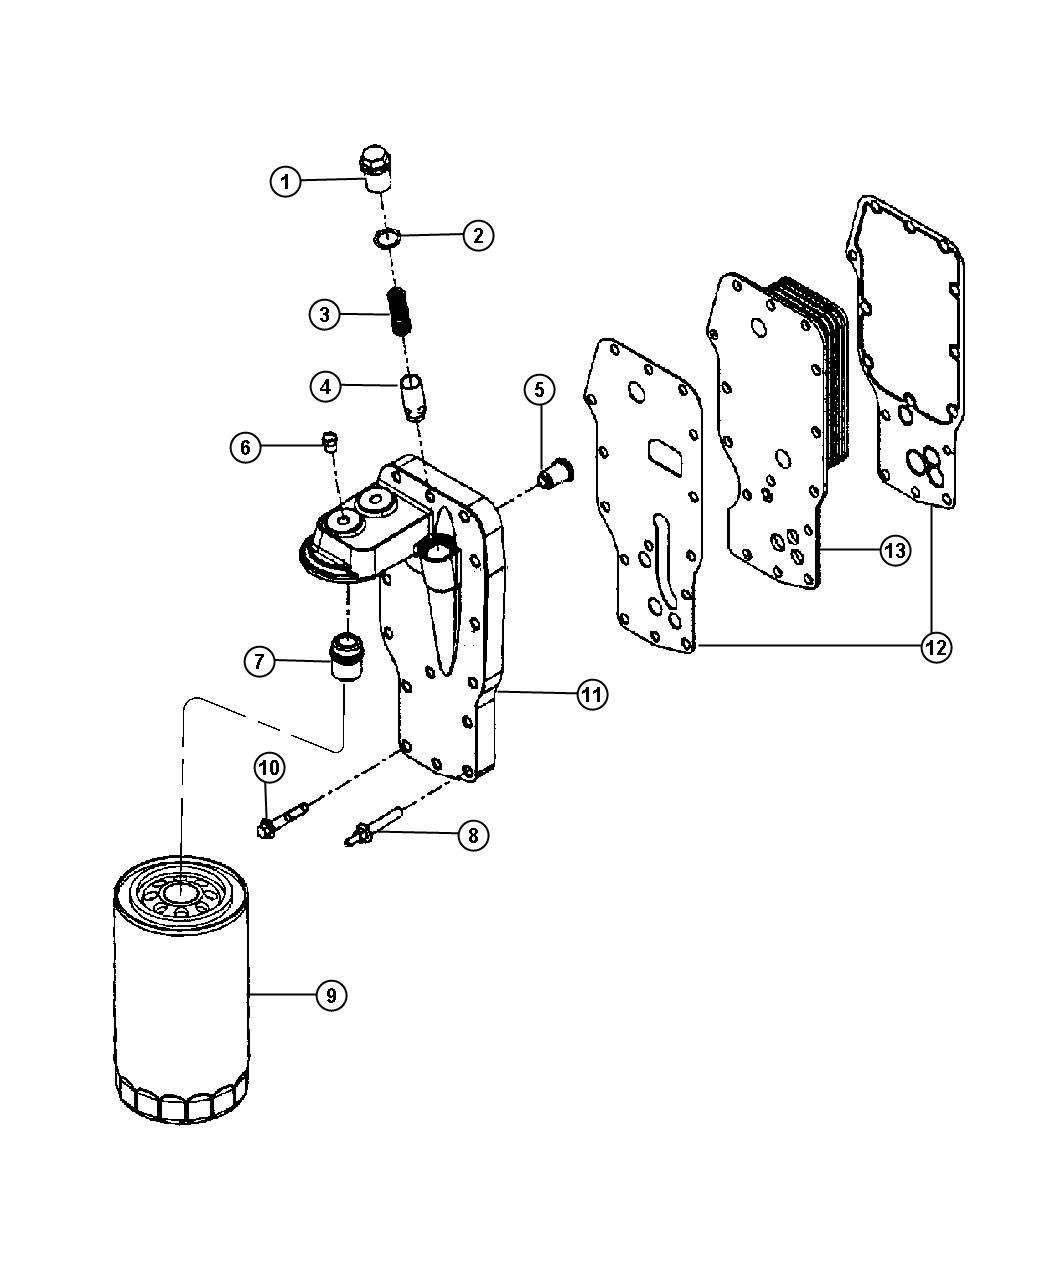 Dodge Ram 4500 Adapter, head. Oil filter. Emissions